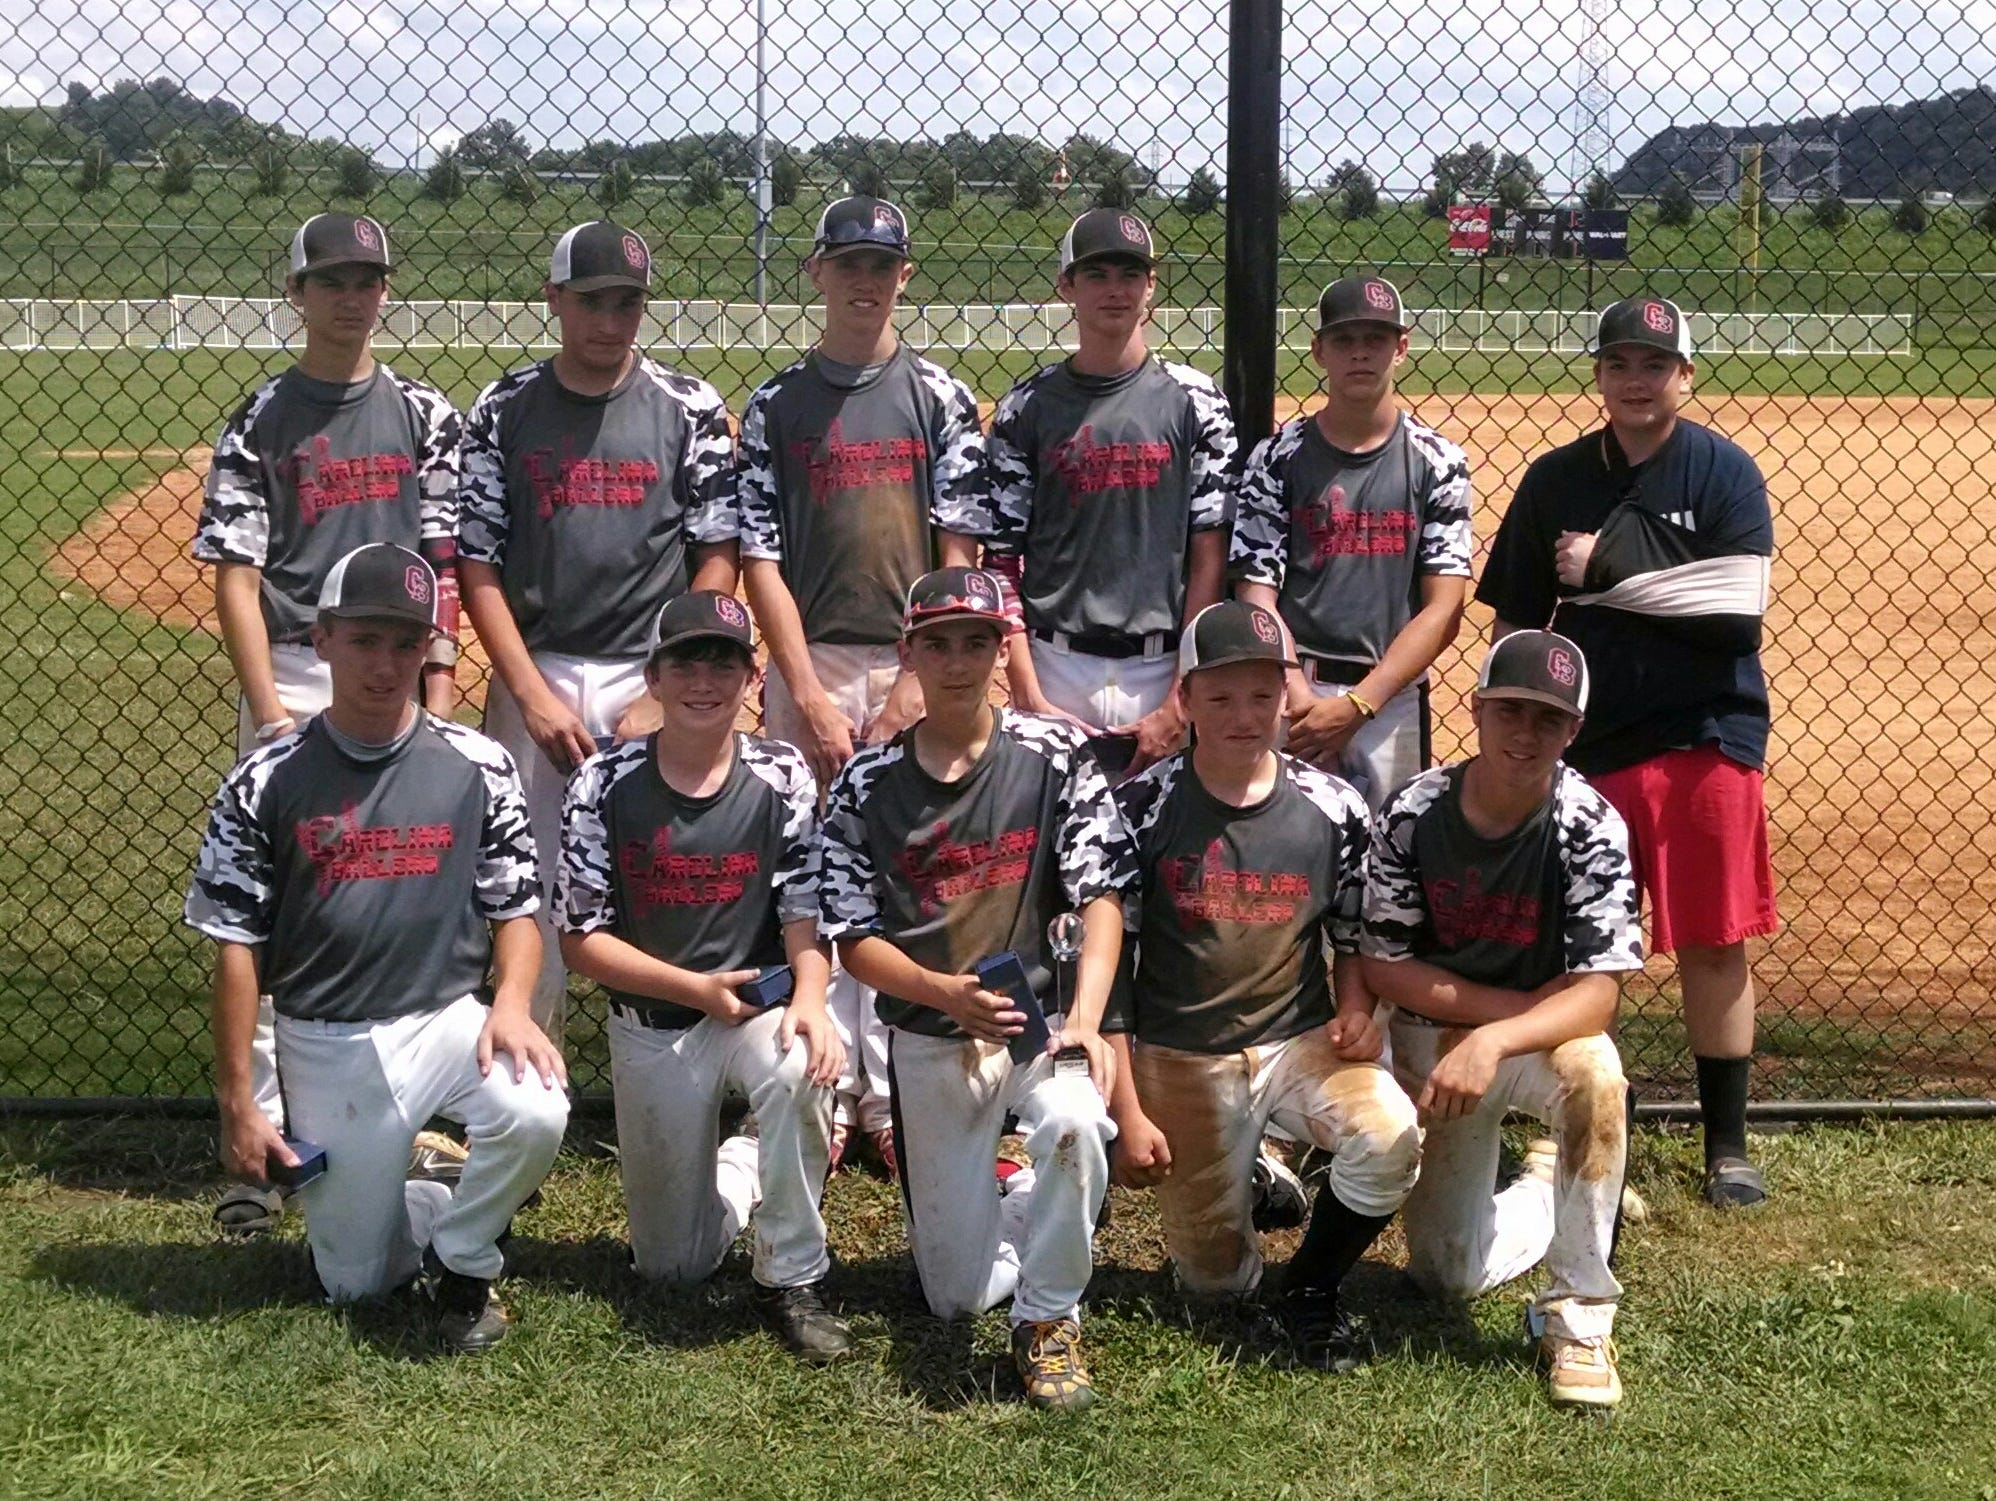 The Carolina Ballers 14U baseball team.